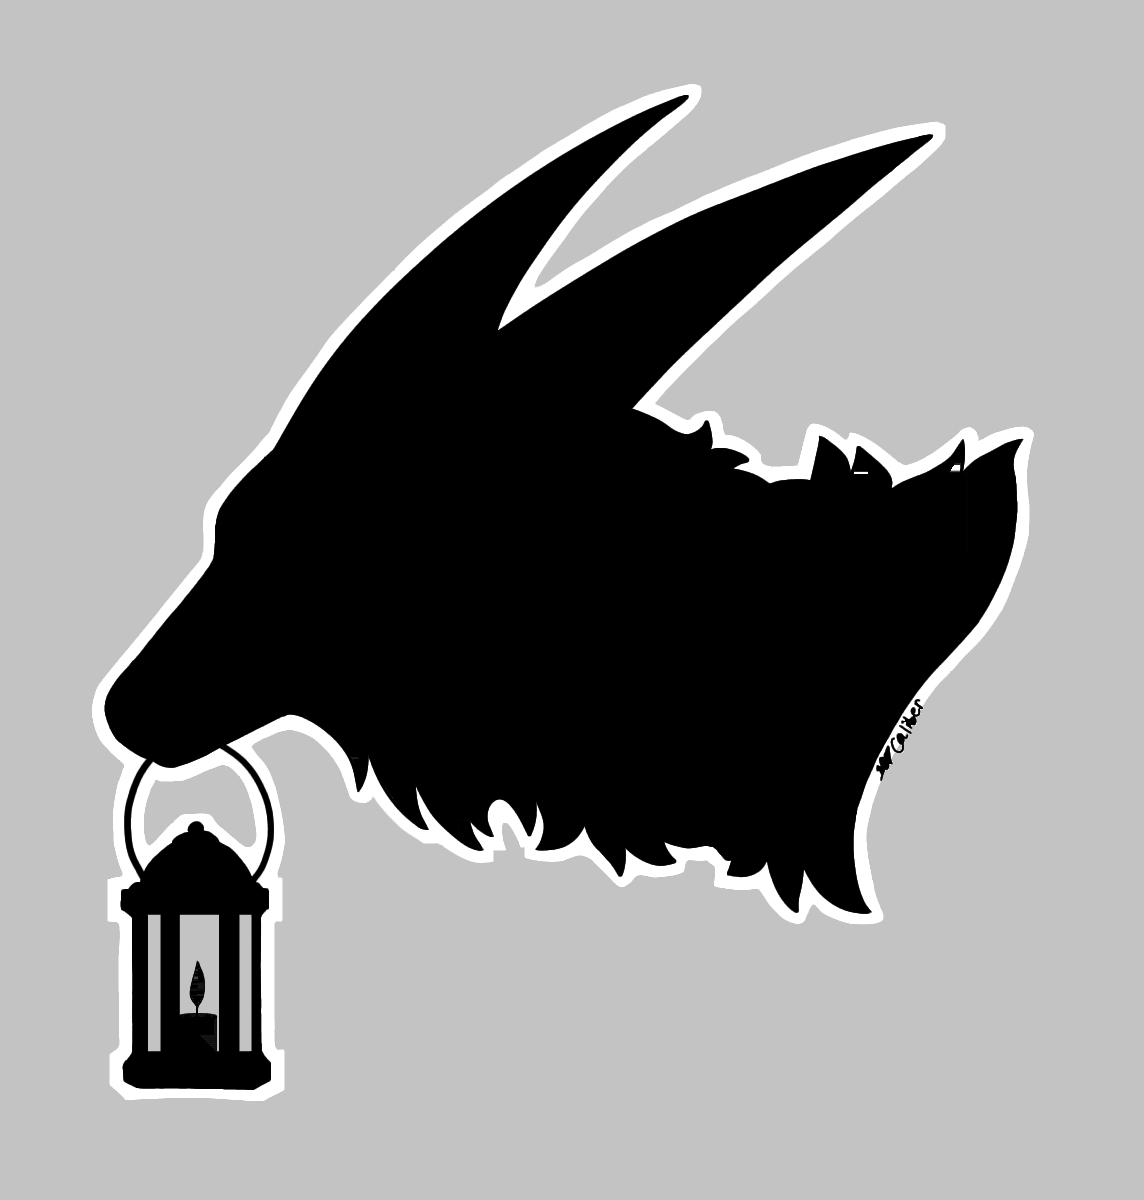 Angel Dragon Lantern Base By 107caliber On Deviantart